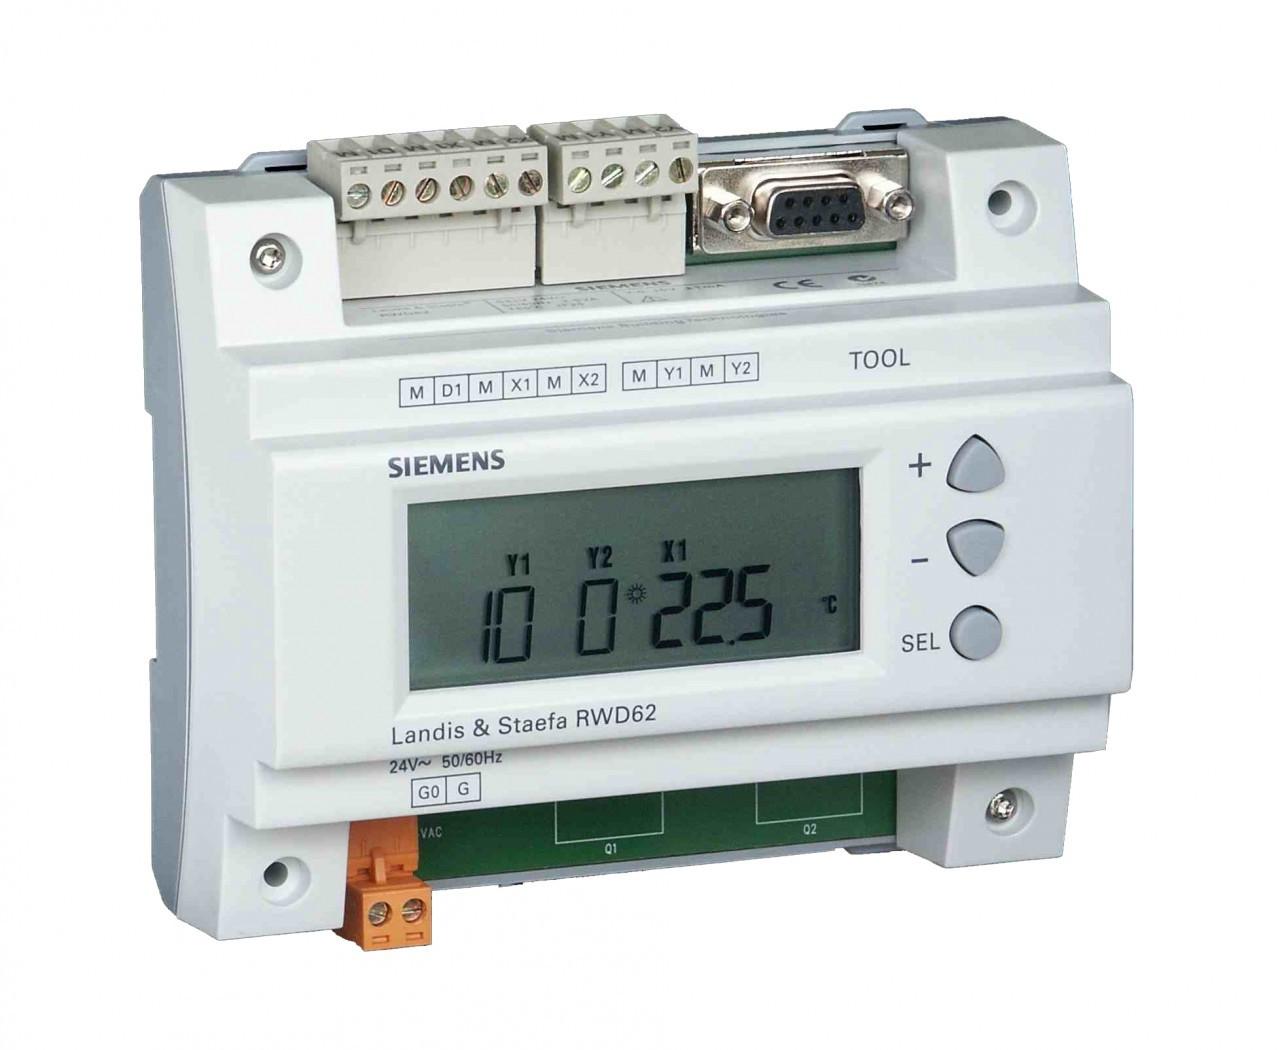 Siemens RWD62, Universal controller